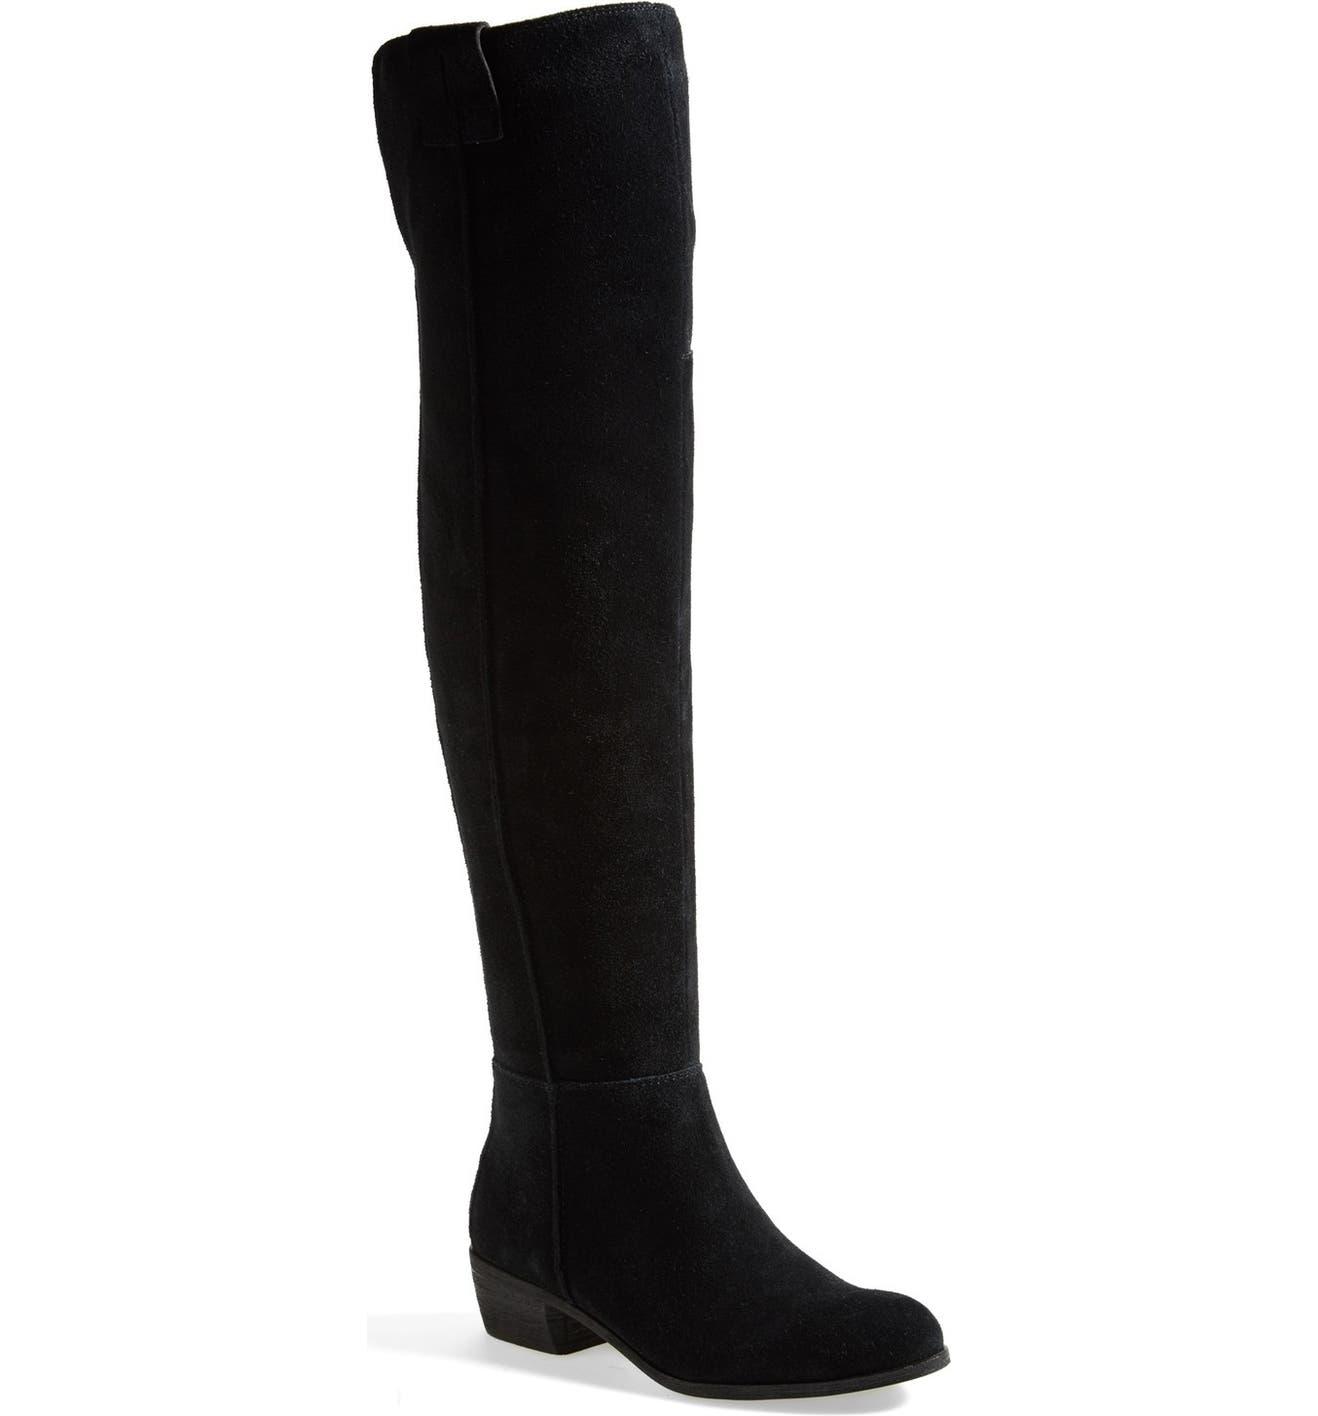 27a08cdc1607 Sam Edelman  Johanna  Over the Knee Suede Boot (Women)